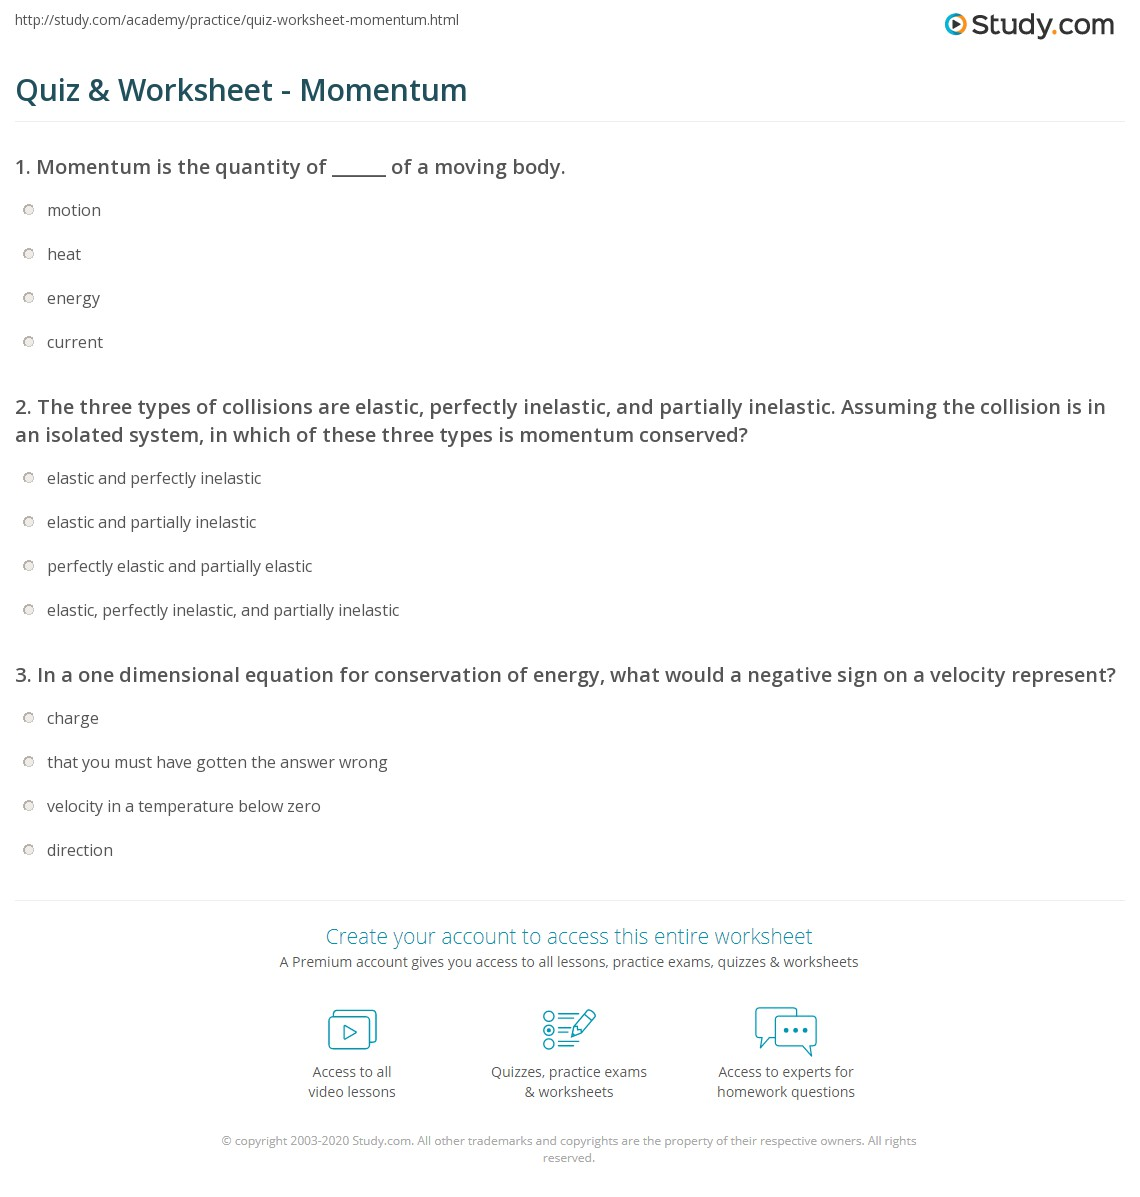 Quiz & Worksheet - Momentum | Study.com